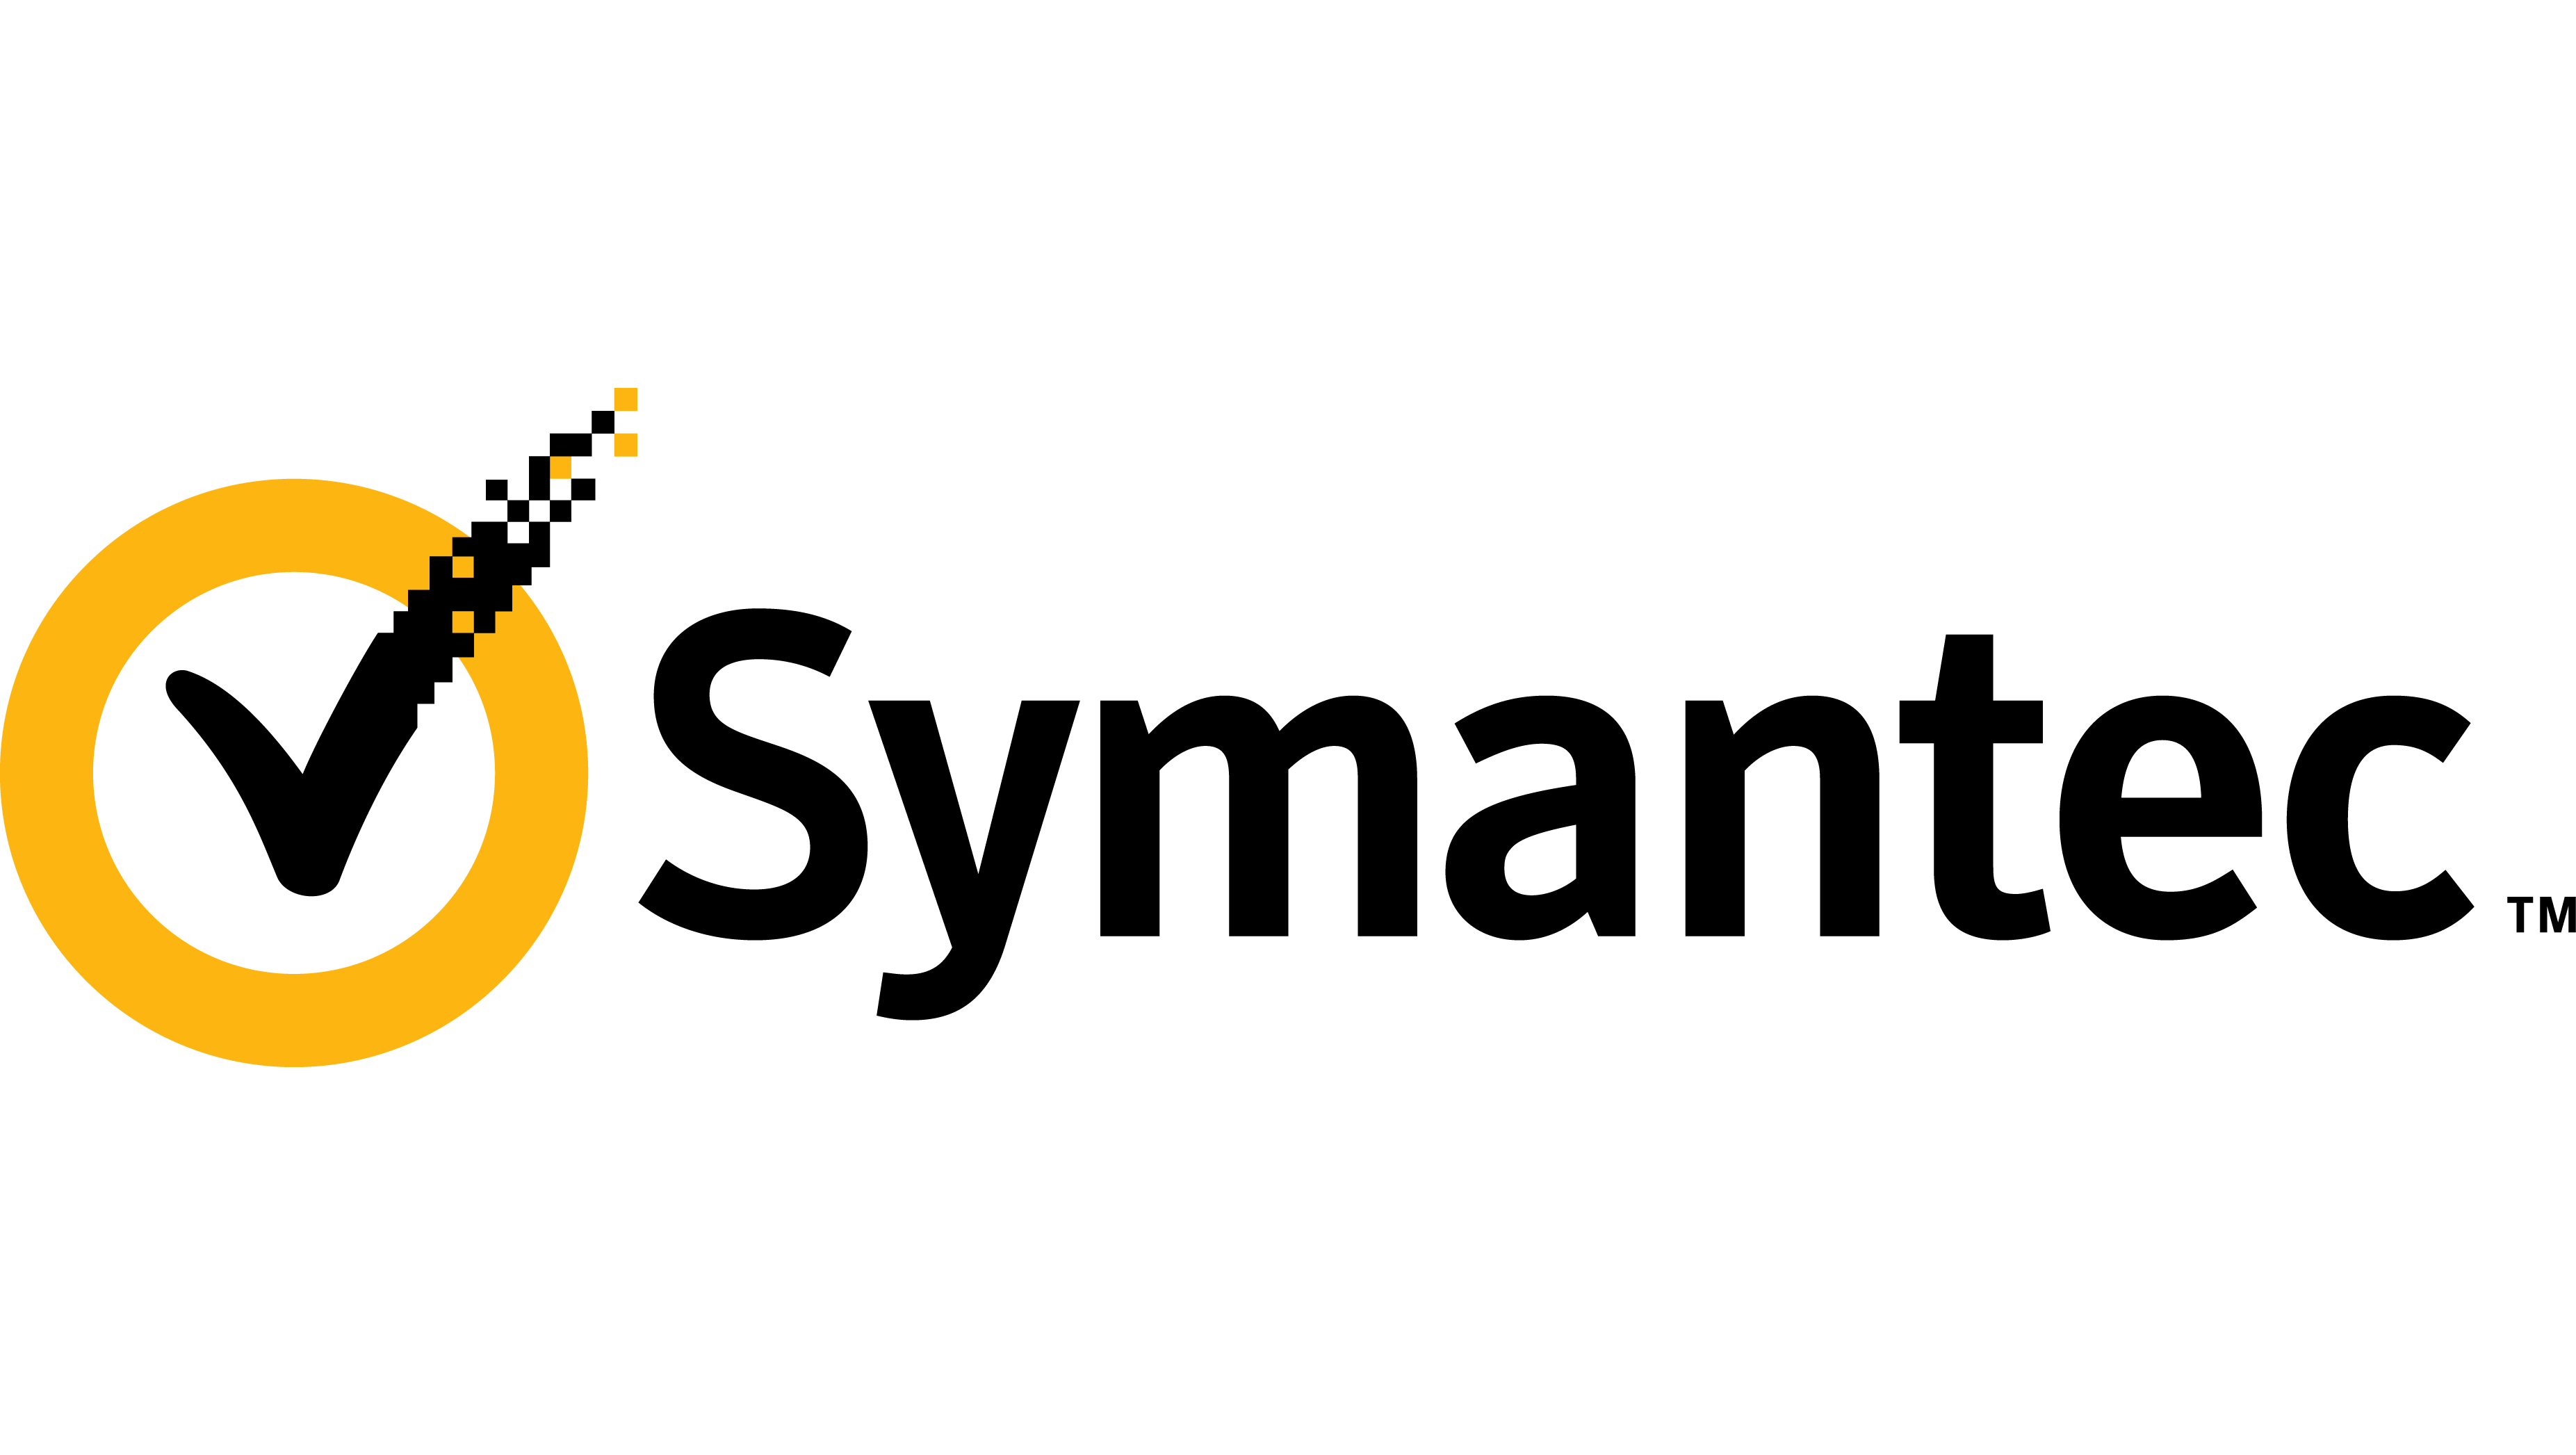 C3 Customer - Symantec